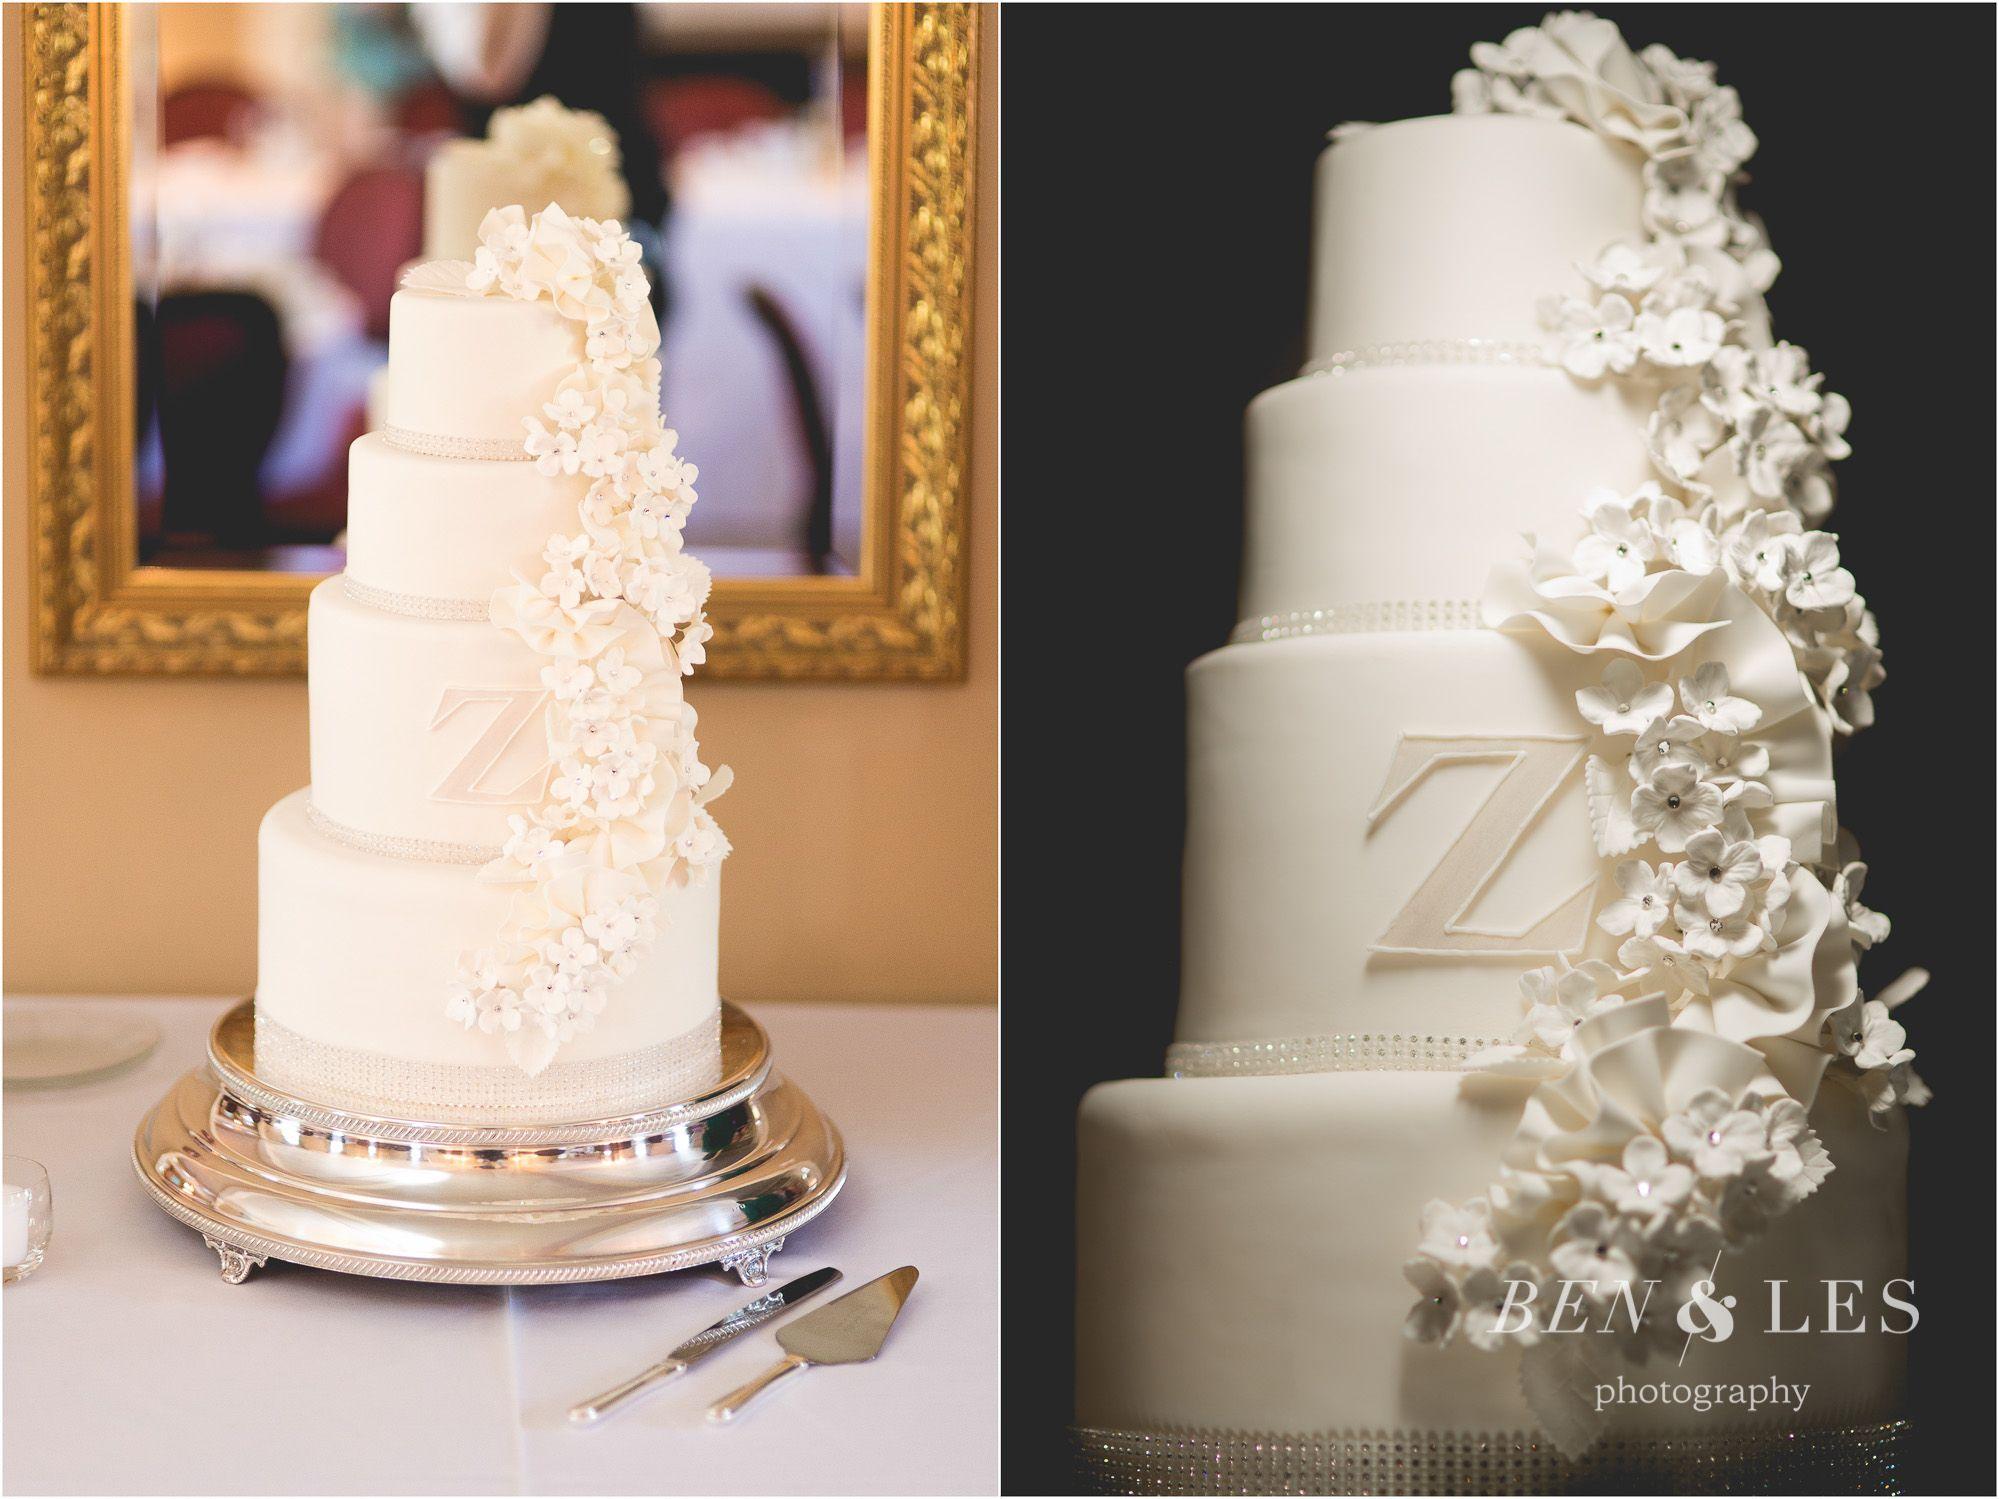 Ben & Les Photography Columbus Wedding Photography benandles.com